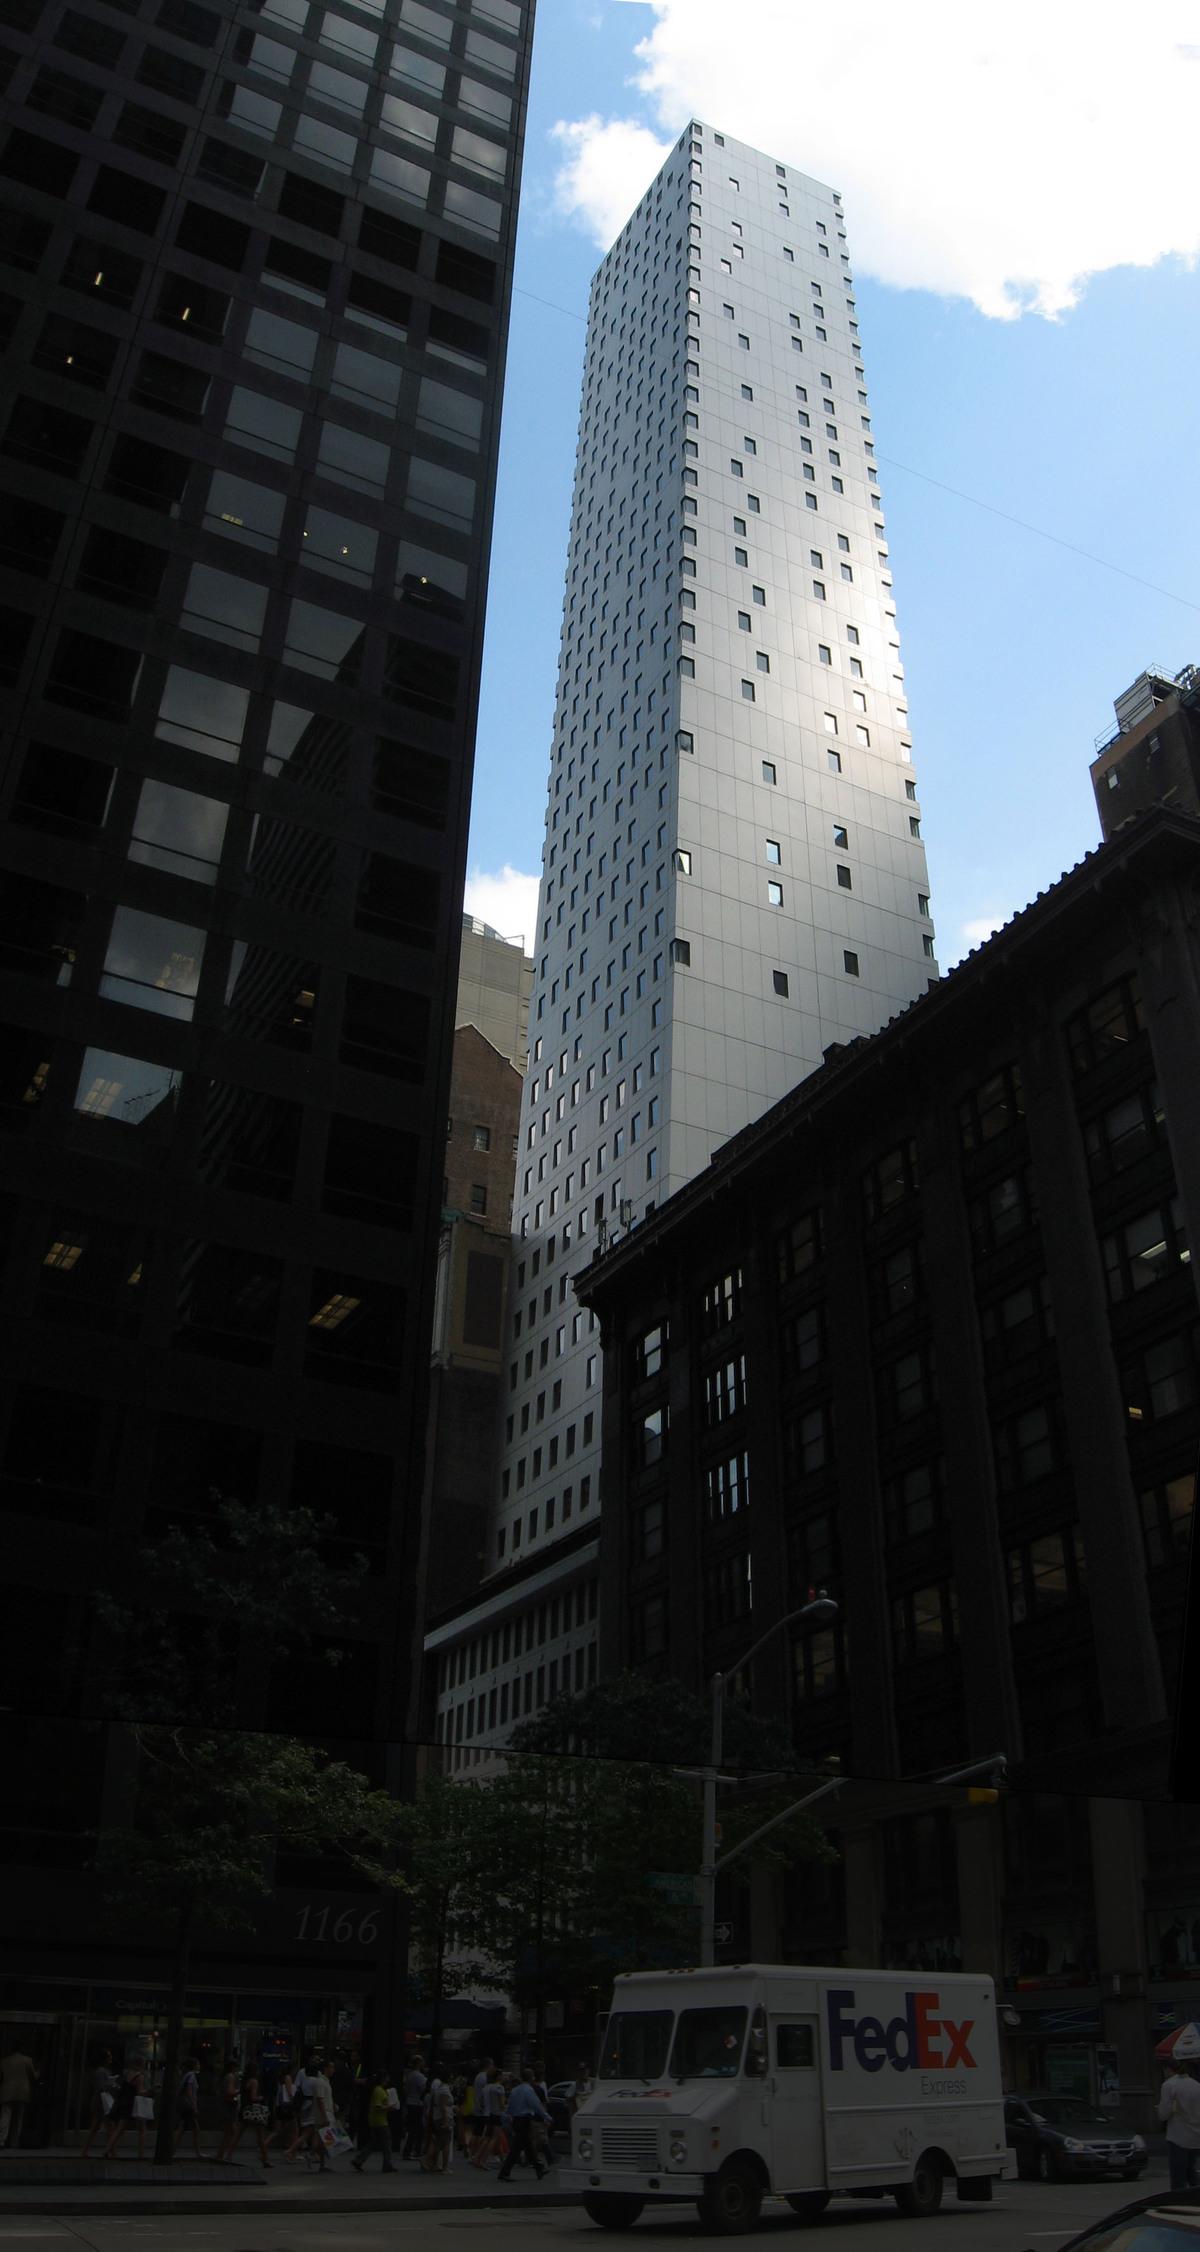 Cassa new york cetraruddy archinect for Interior design firms new york ny